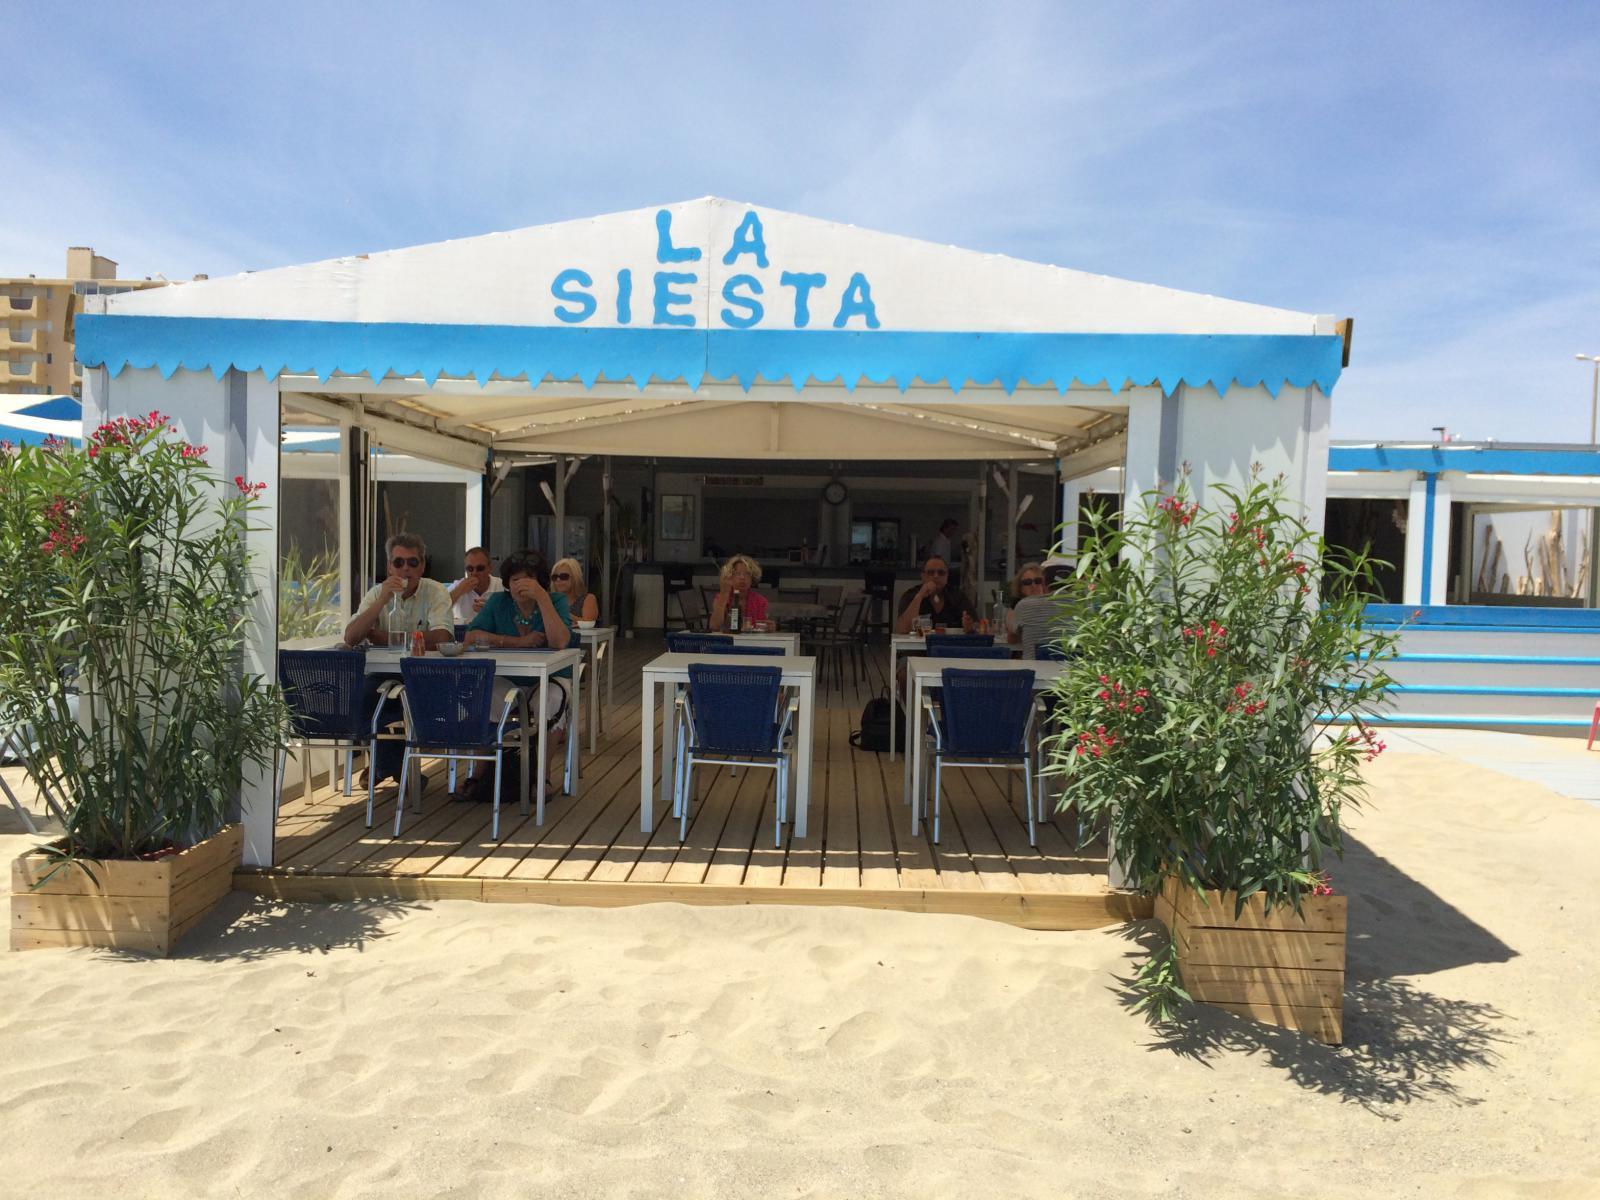 La siesta plage priv e canet en roussillon 66140 canet - Office du tourisme de canet en roussillon 66140 ...